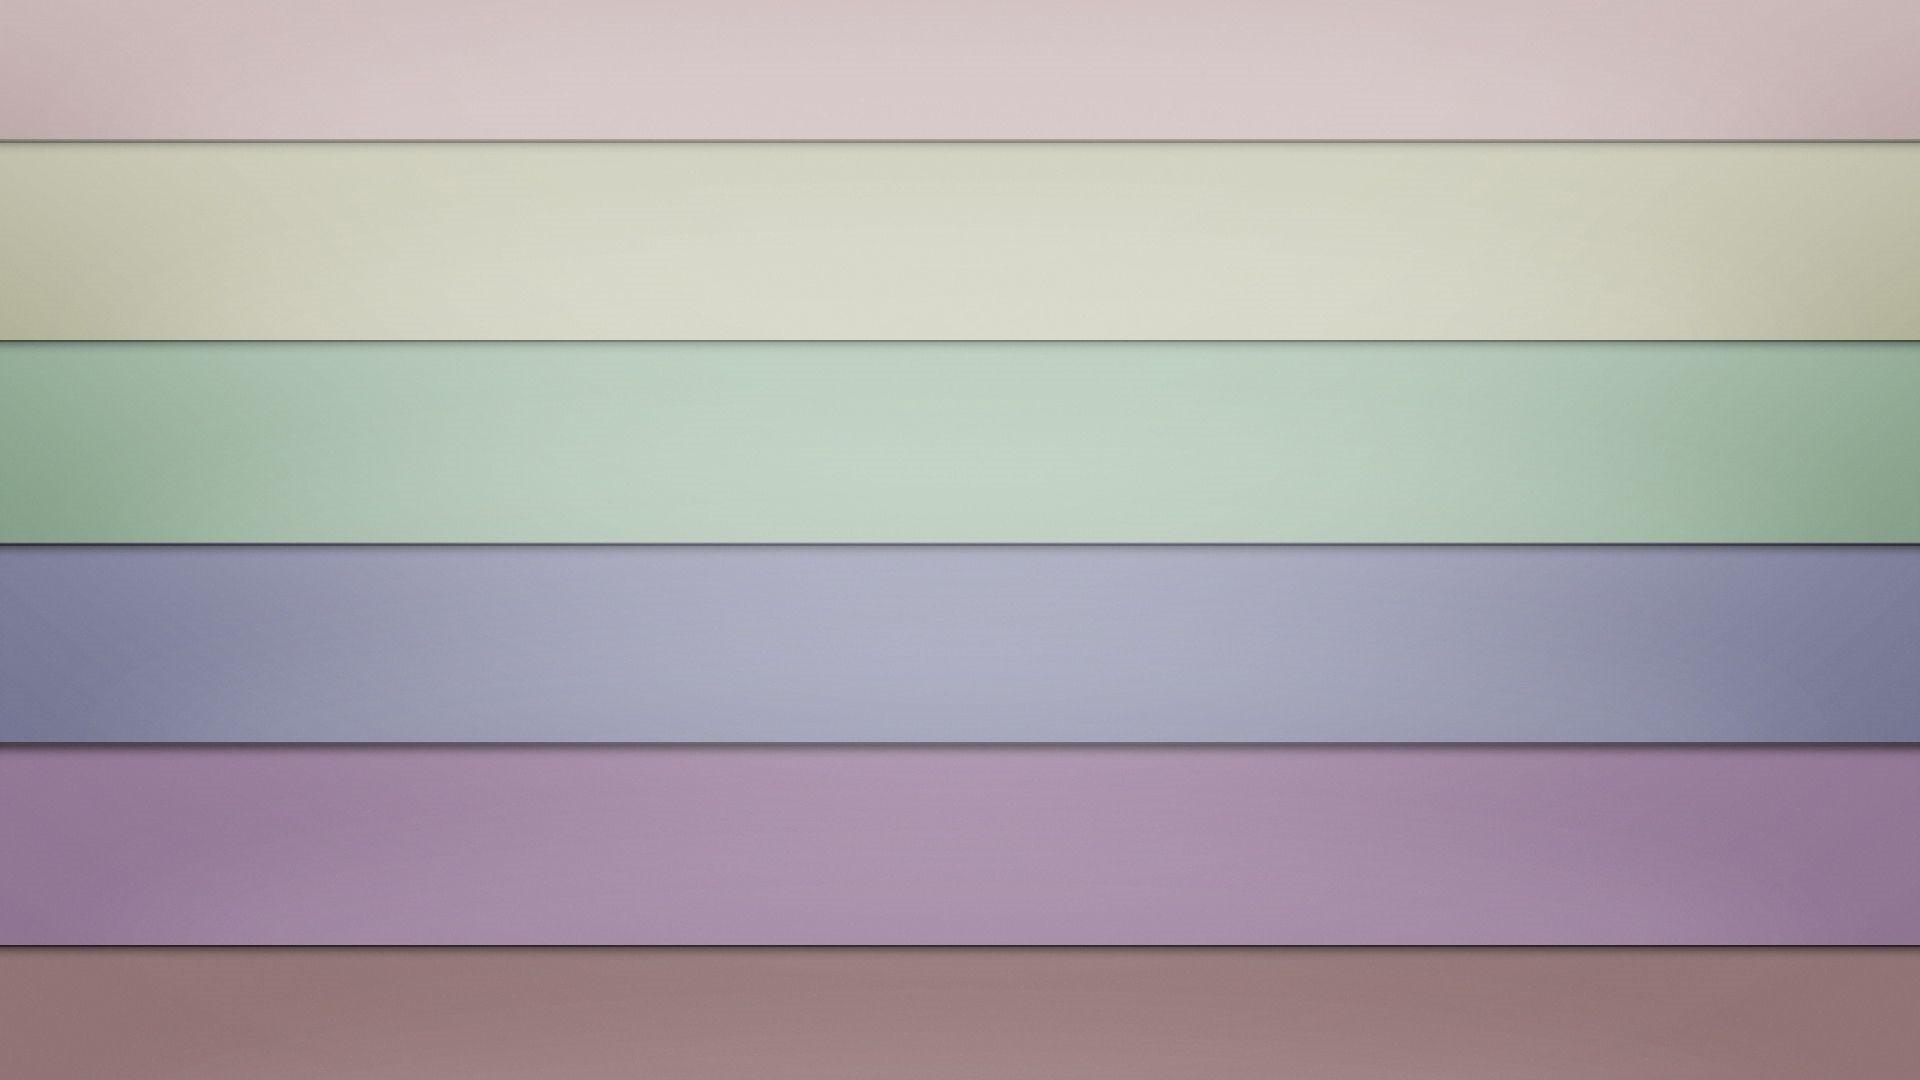 Pastel Color Download Wallpaper